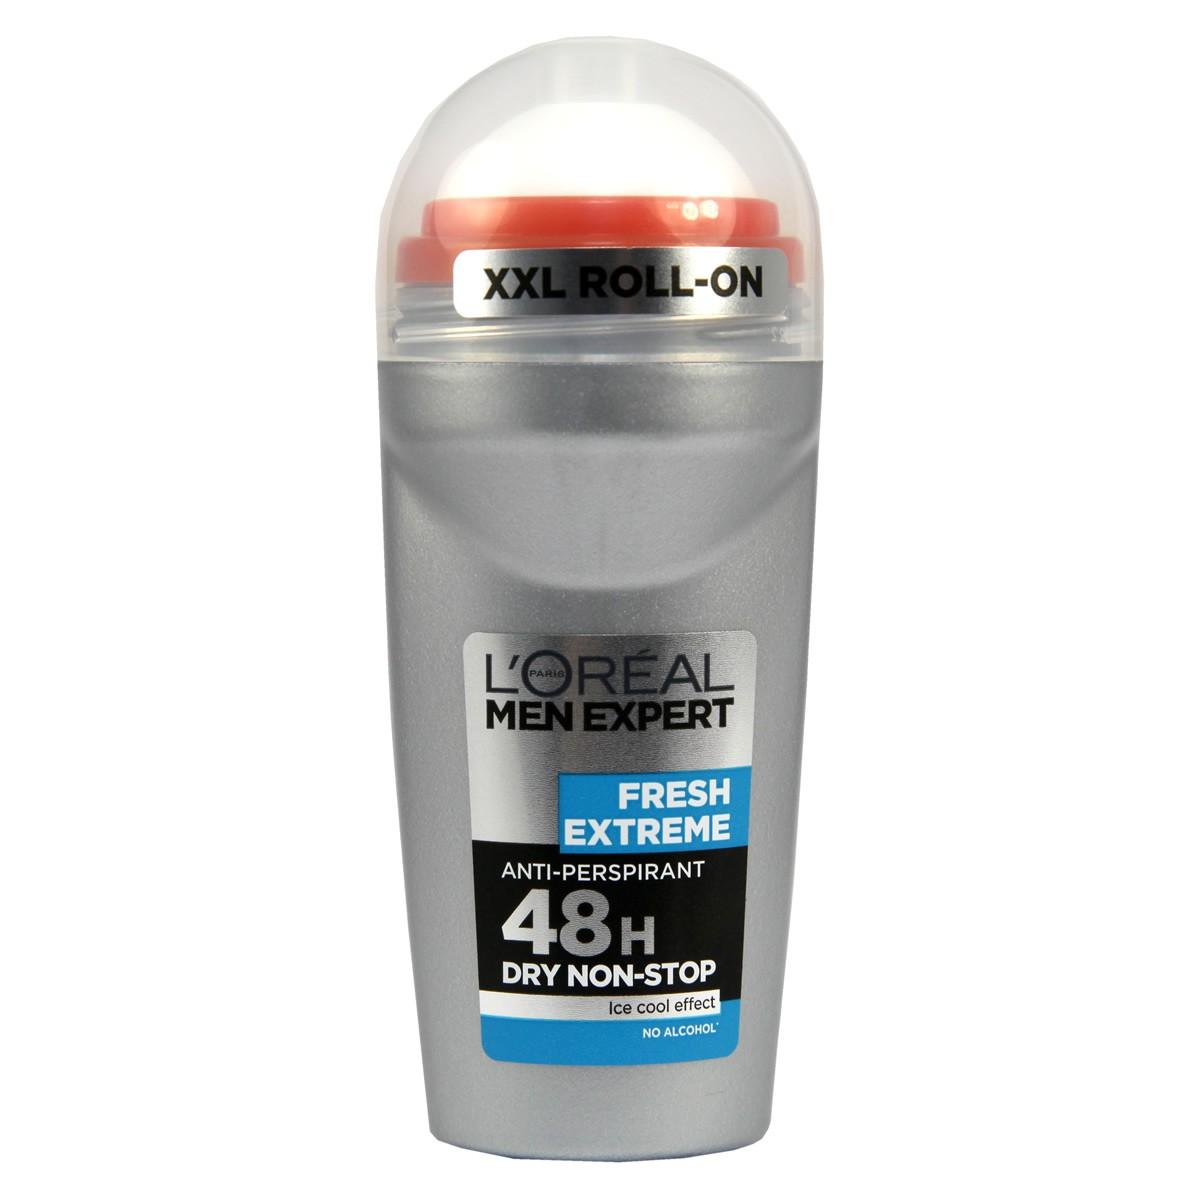 L'Oreal Paris Men Expert Fresh Extreme 48H Deodorant Roll-On